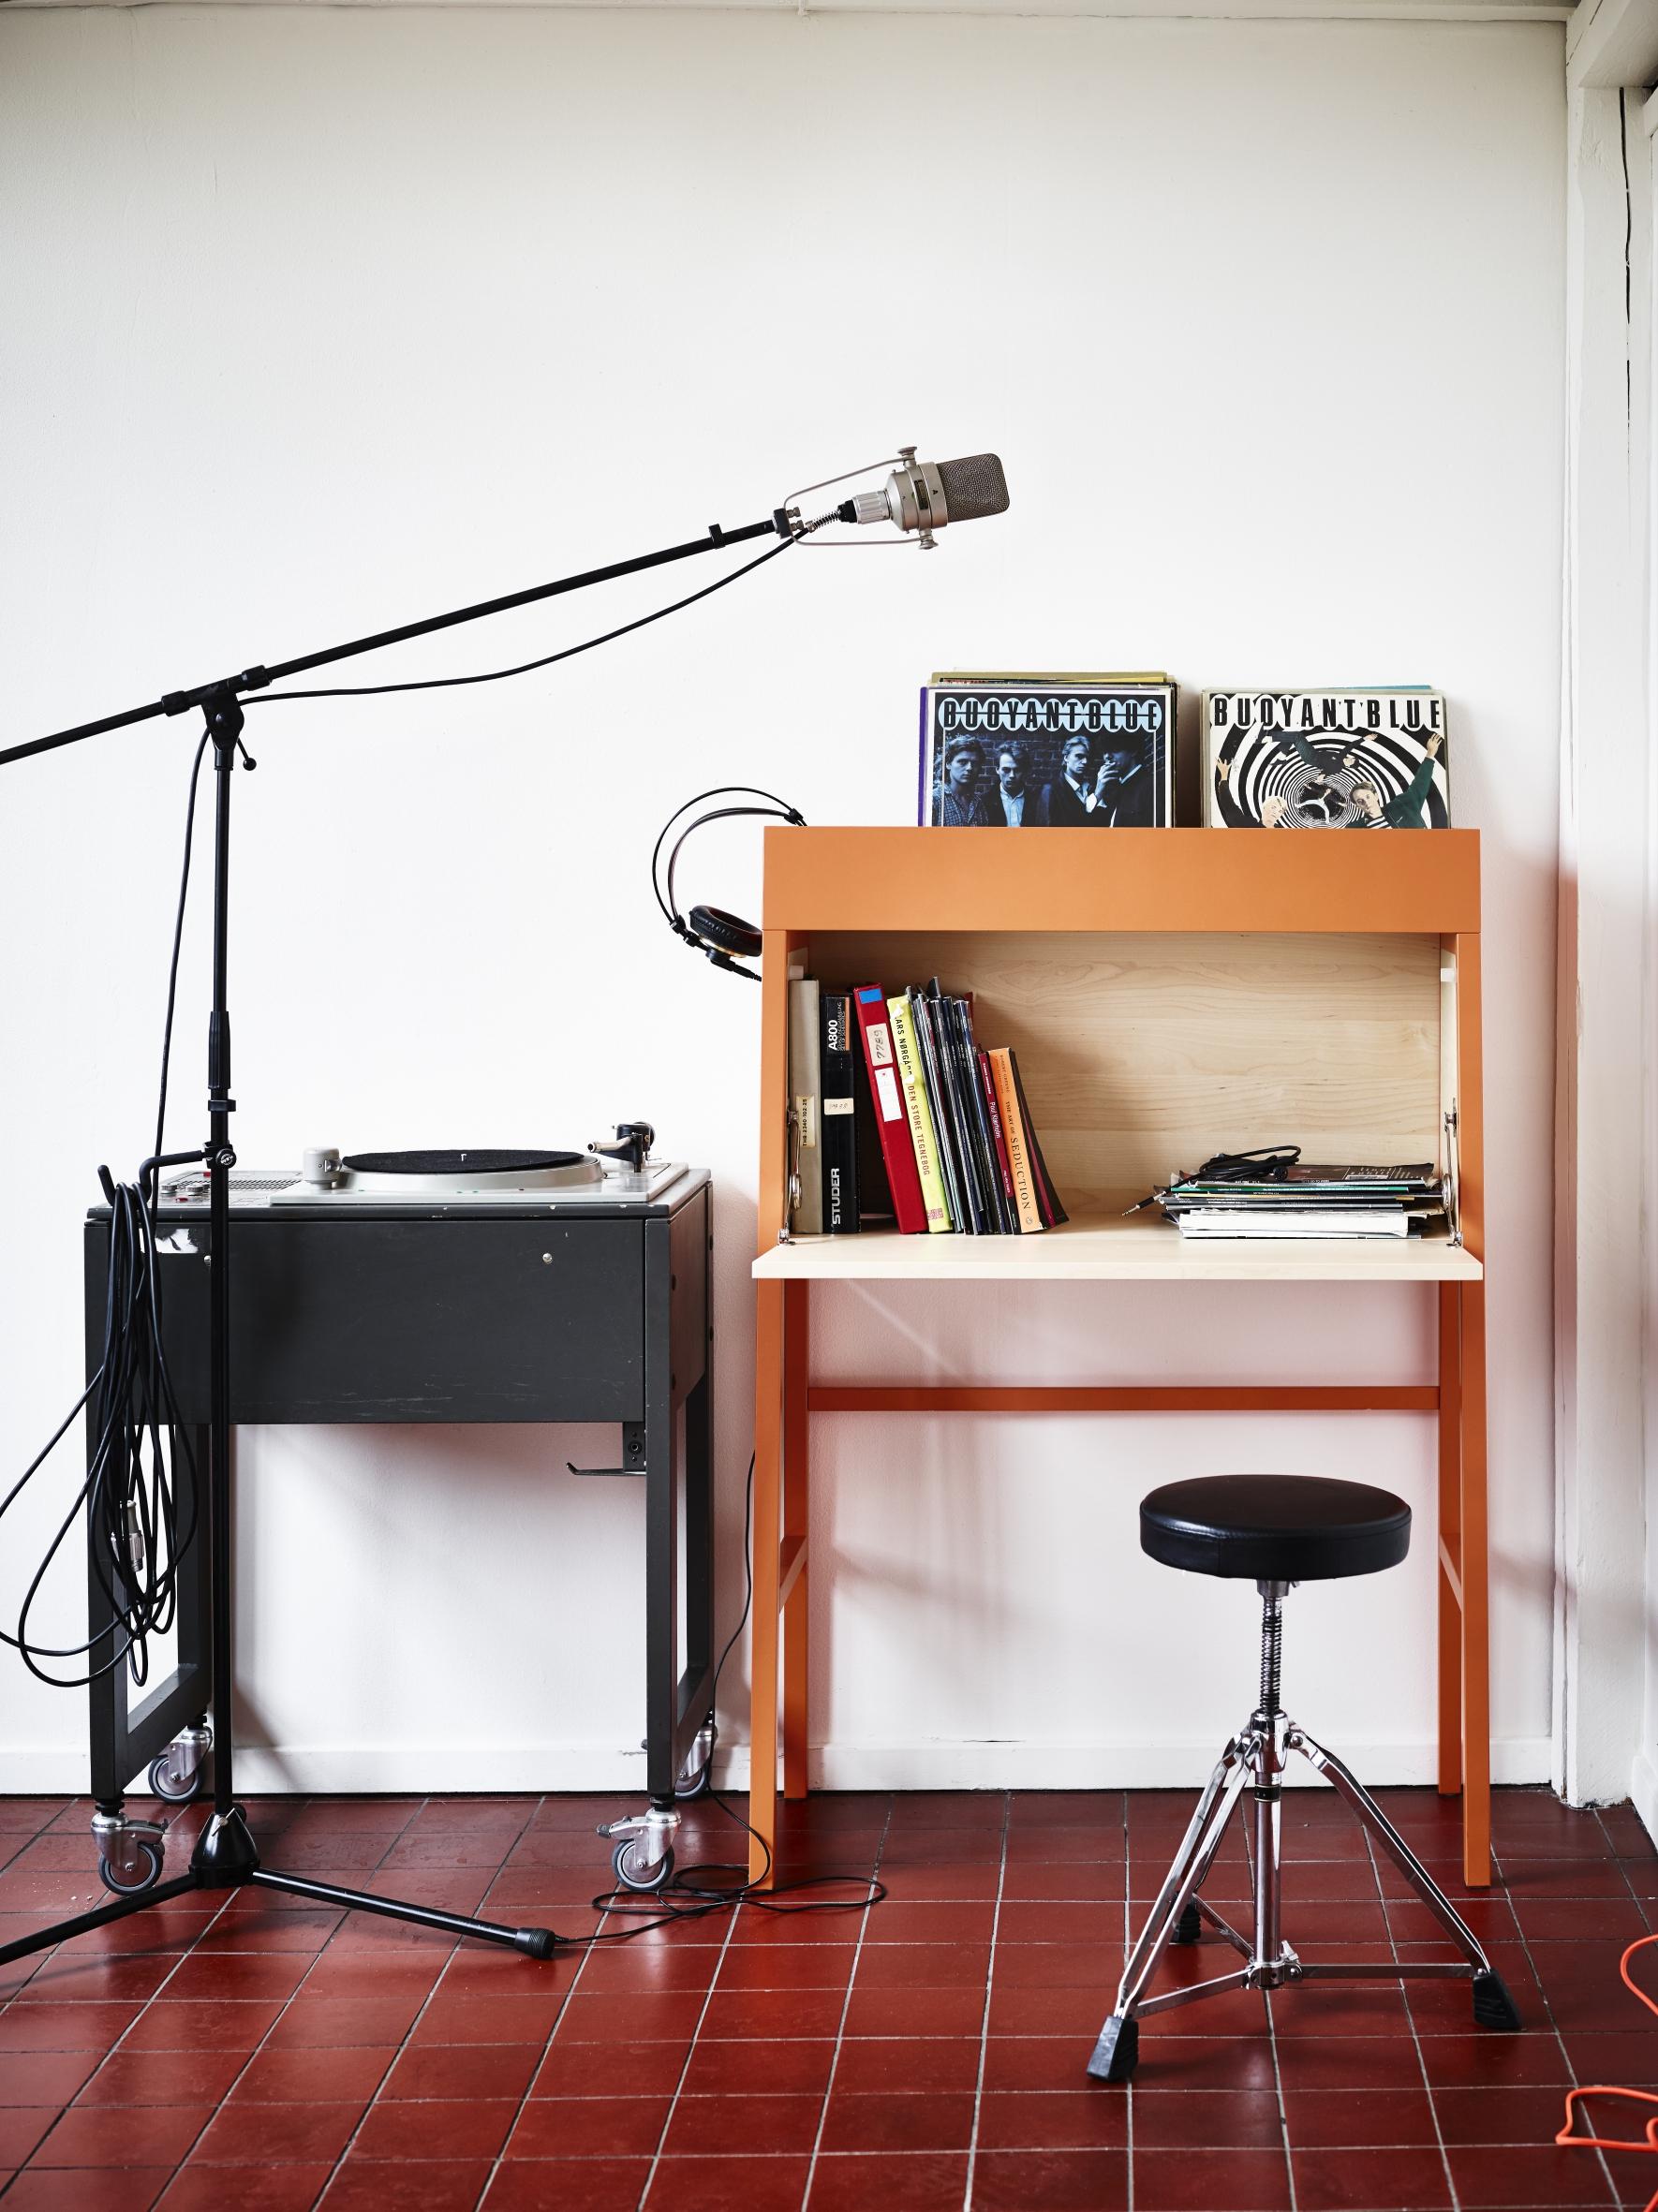 nya ikea ps 2014 malin inredare. Black Bedroom Furniture Sets. Home Design Ideas